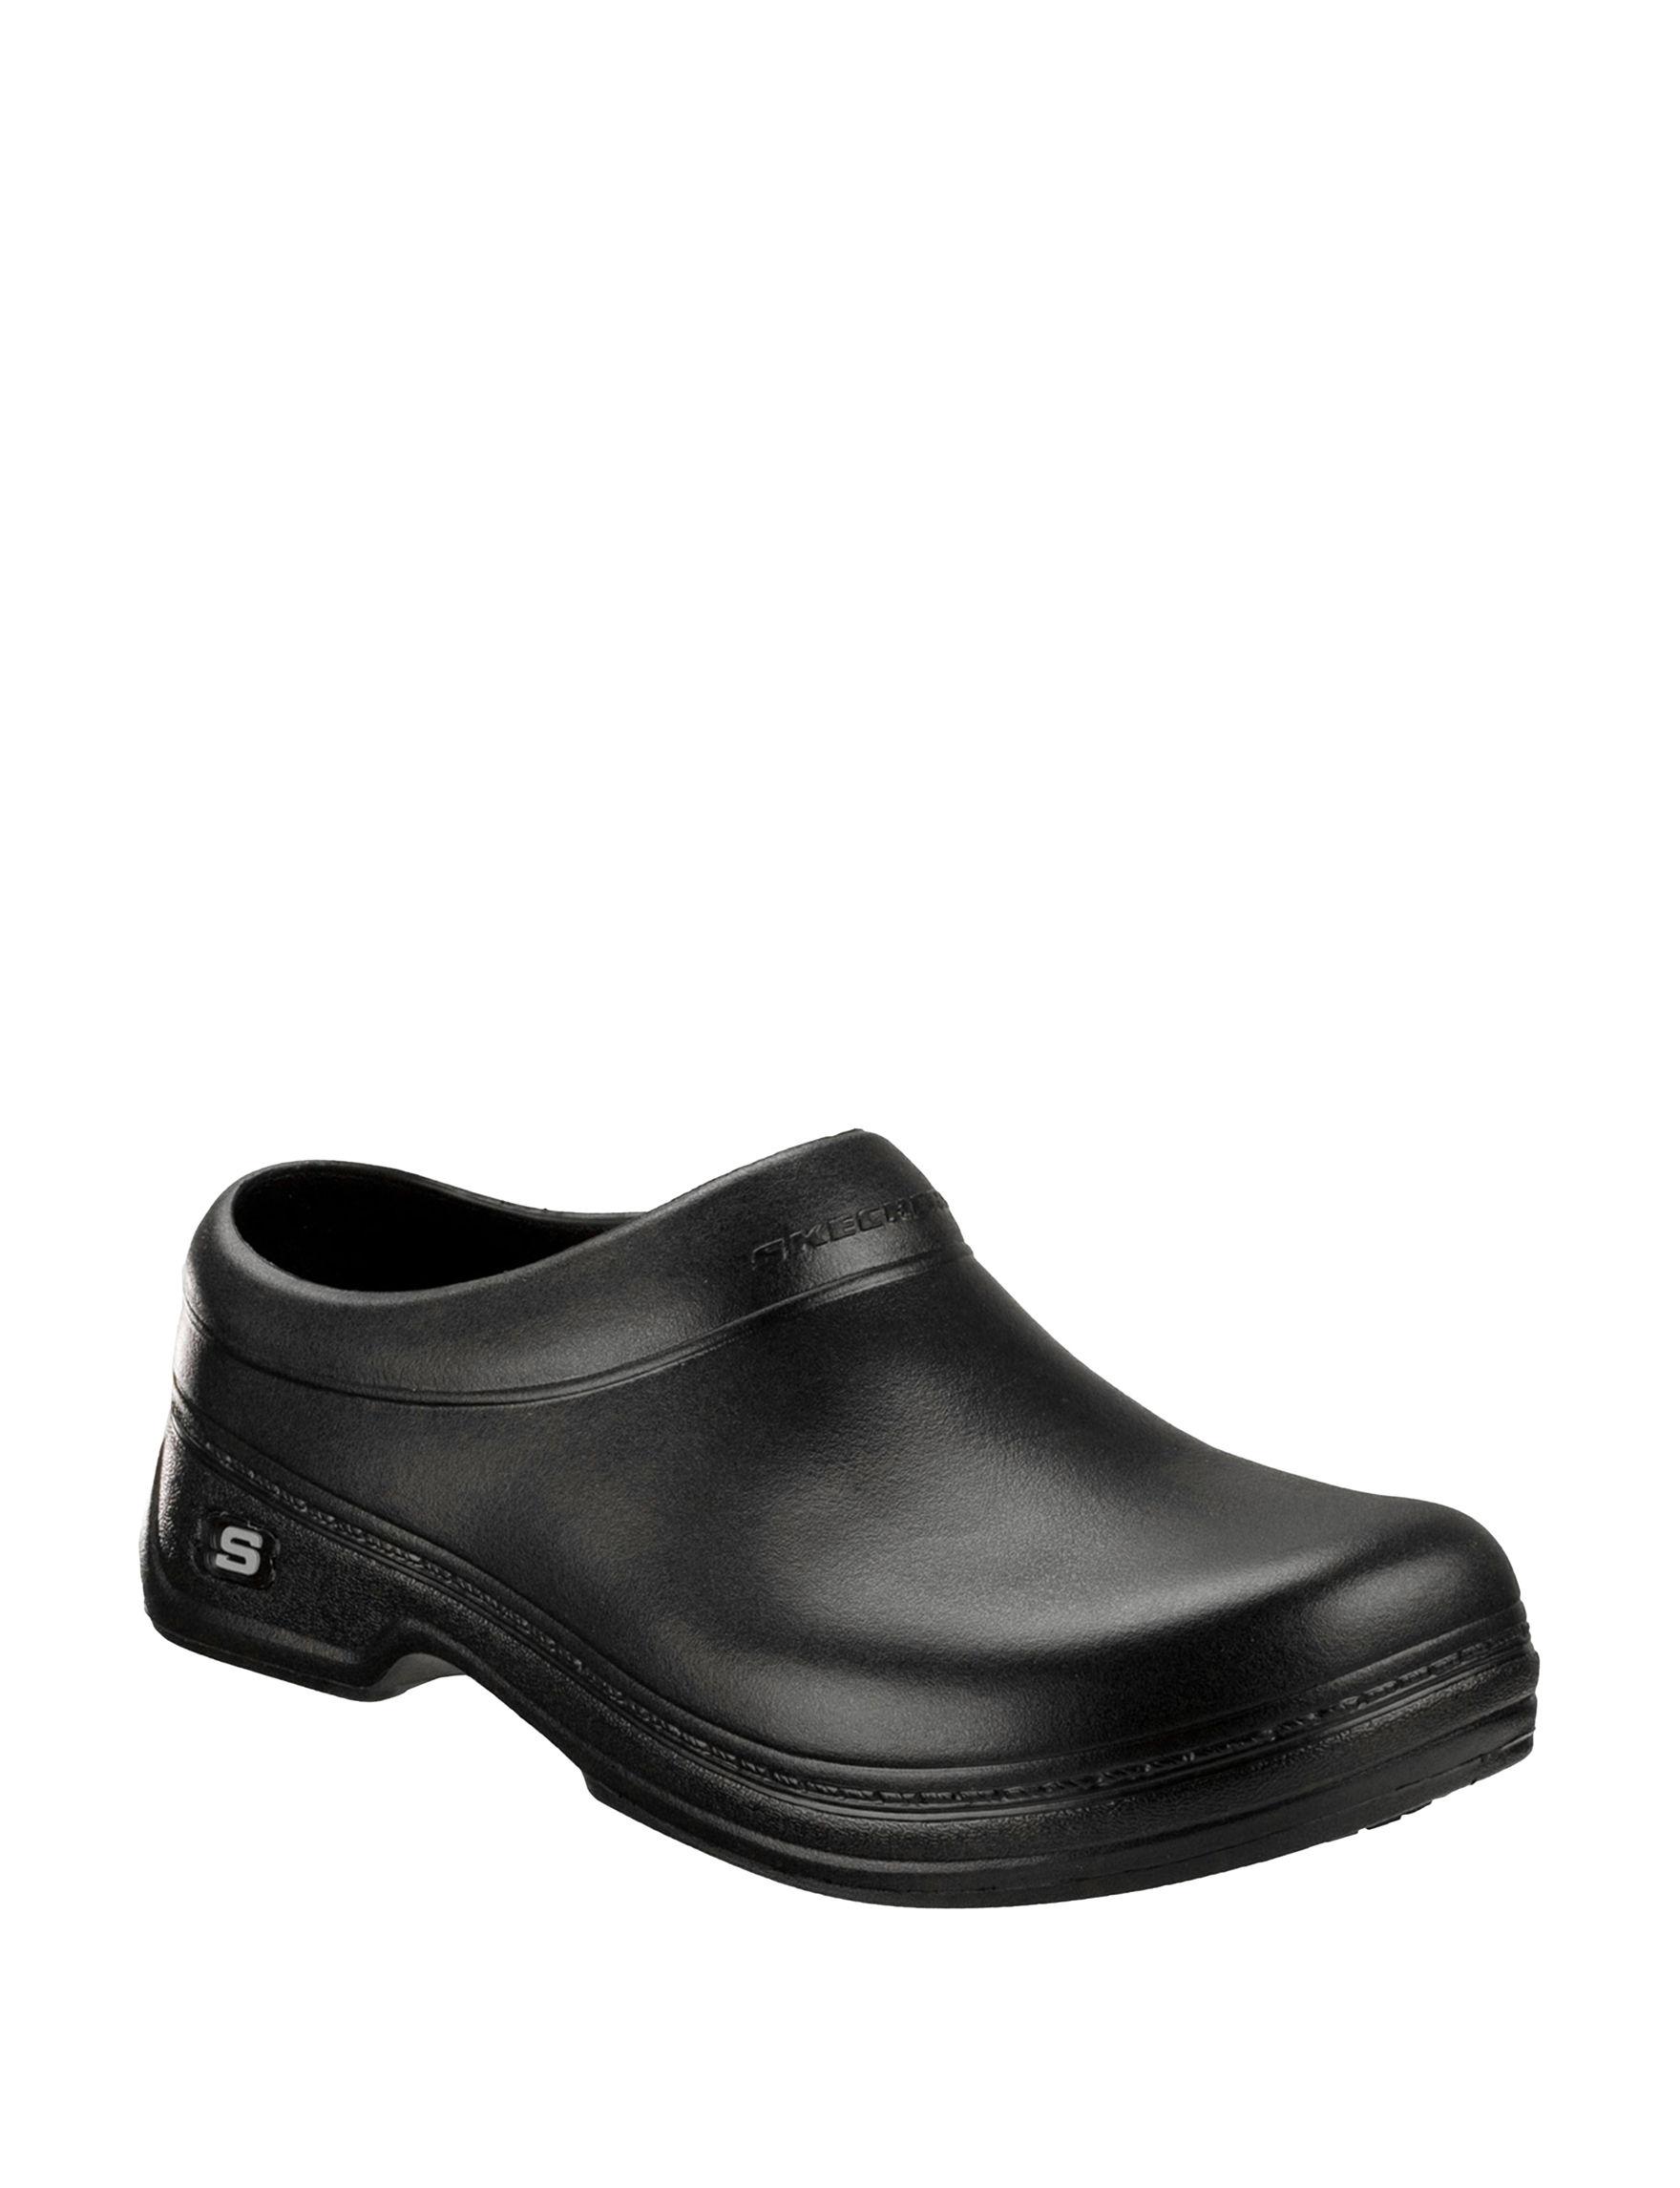 b9cde658 Skechers Men's Oswald Balder Slip Resistant Work Clogs. Online Only. WEB ID  #:606760. product